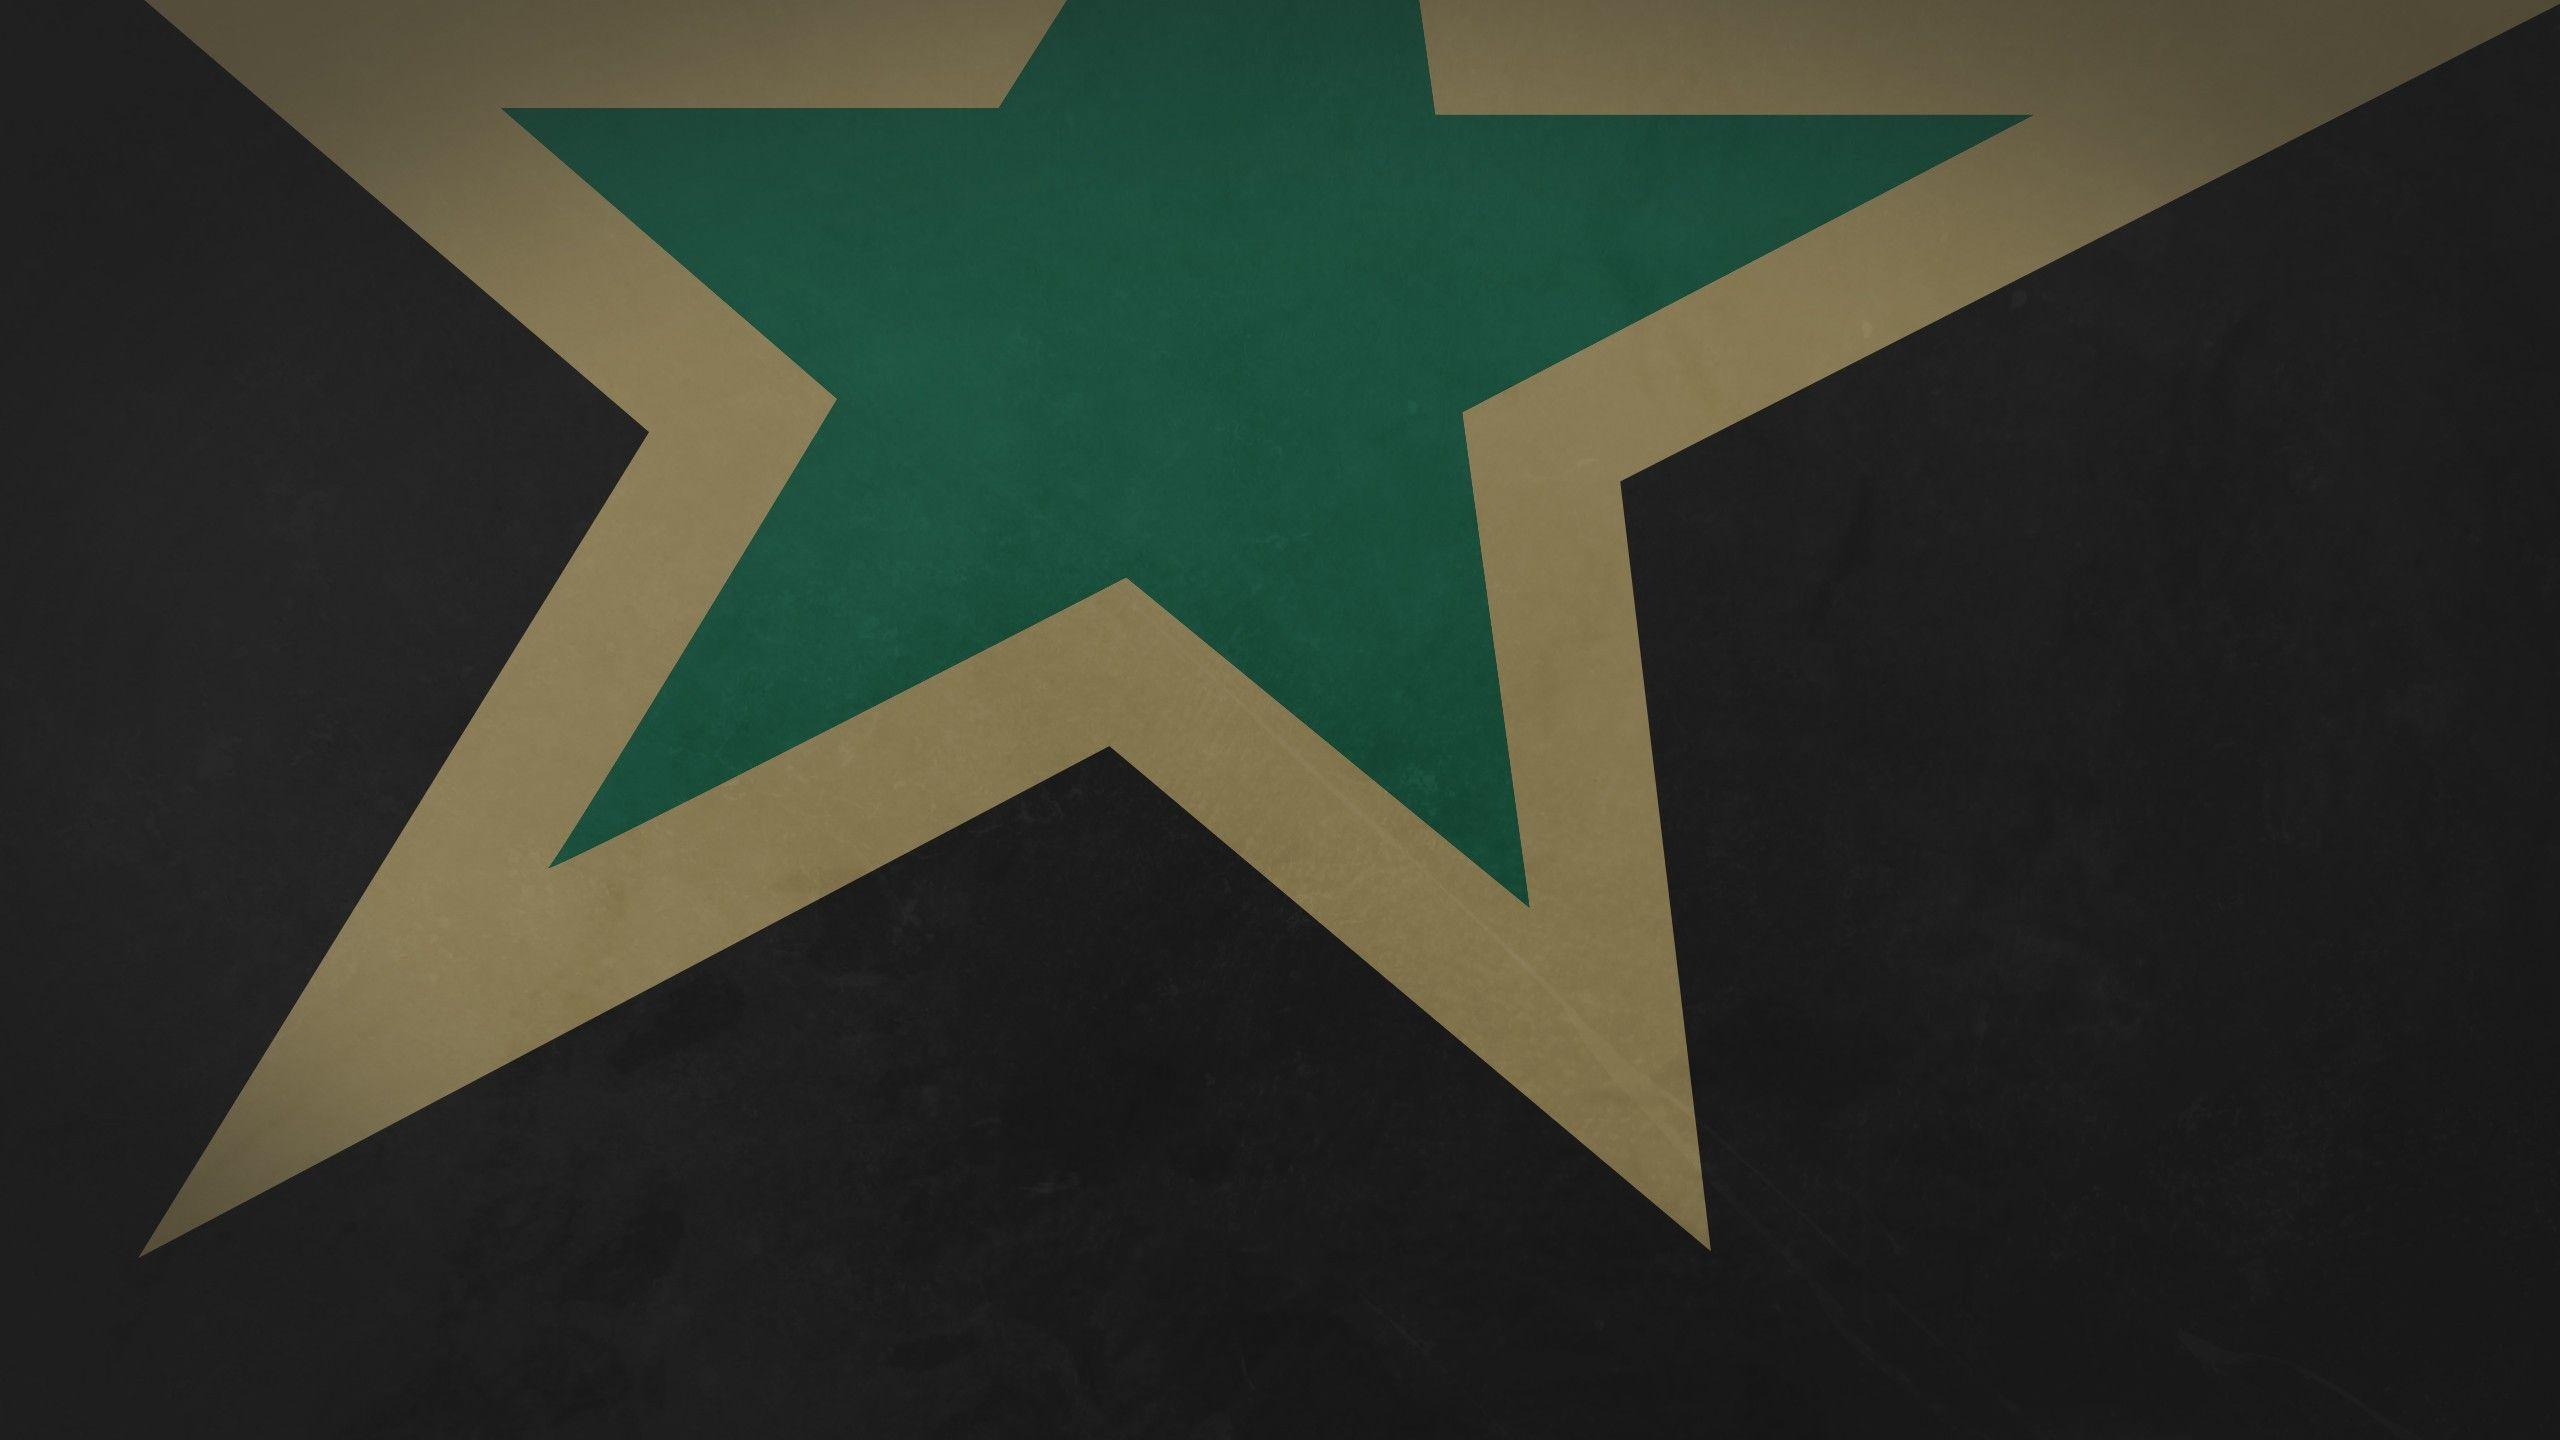 Dallas Stars Computer Wallpapers, Desktop Backgrounds | 2560x1440 ...